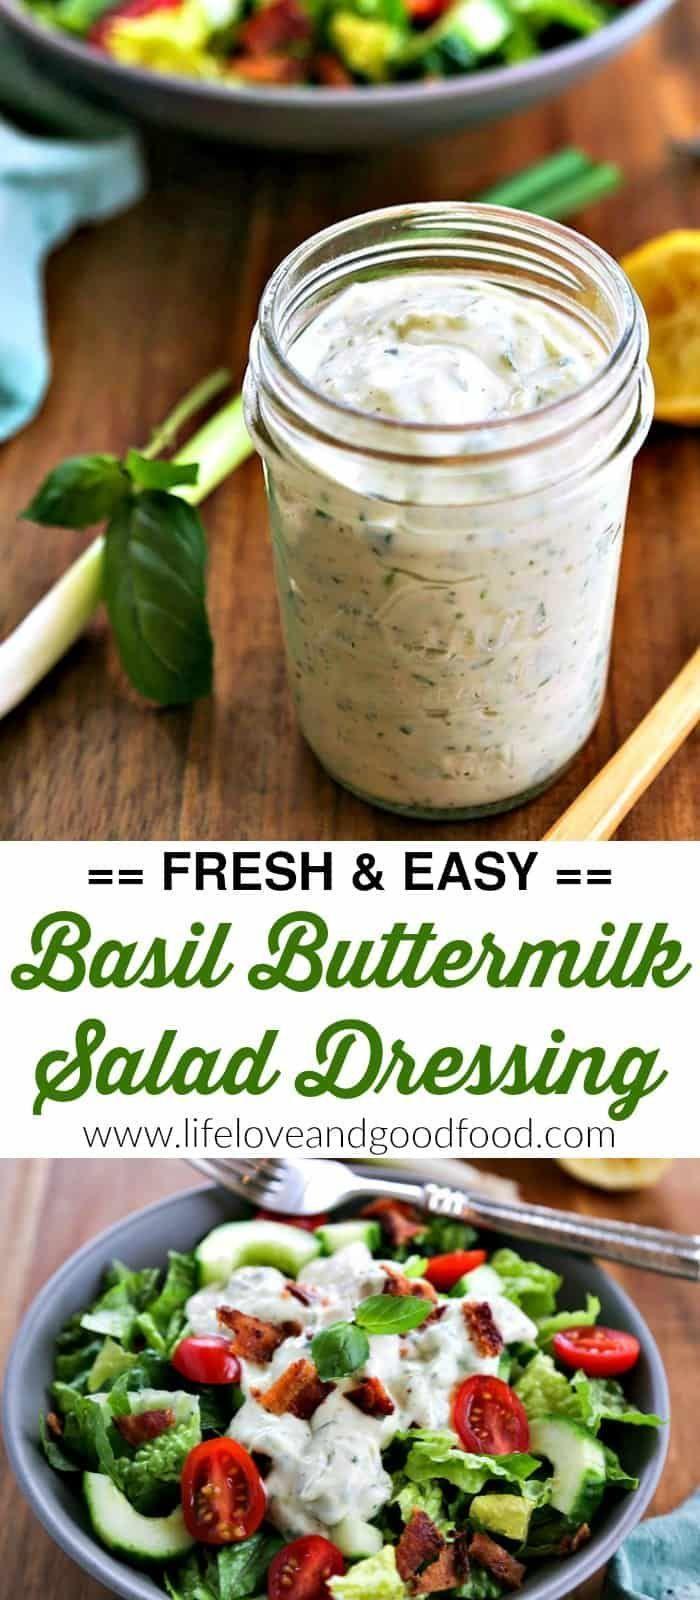 Basil Buttermilk Dressing In 2020 Buttermilk Salad Dressing Vinaigrette Recipes Buttermilk Dressing